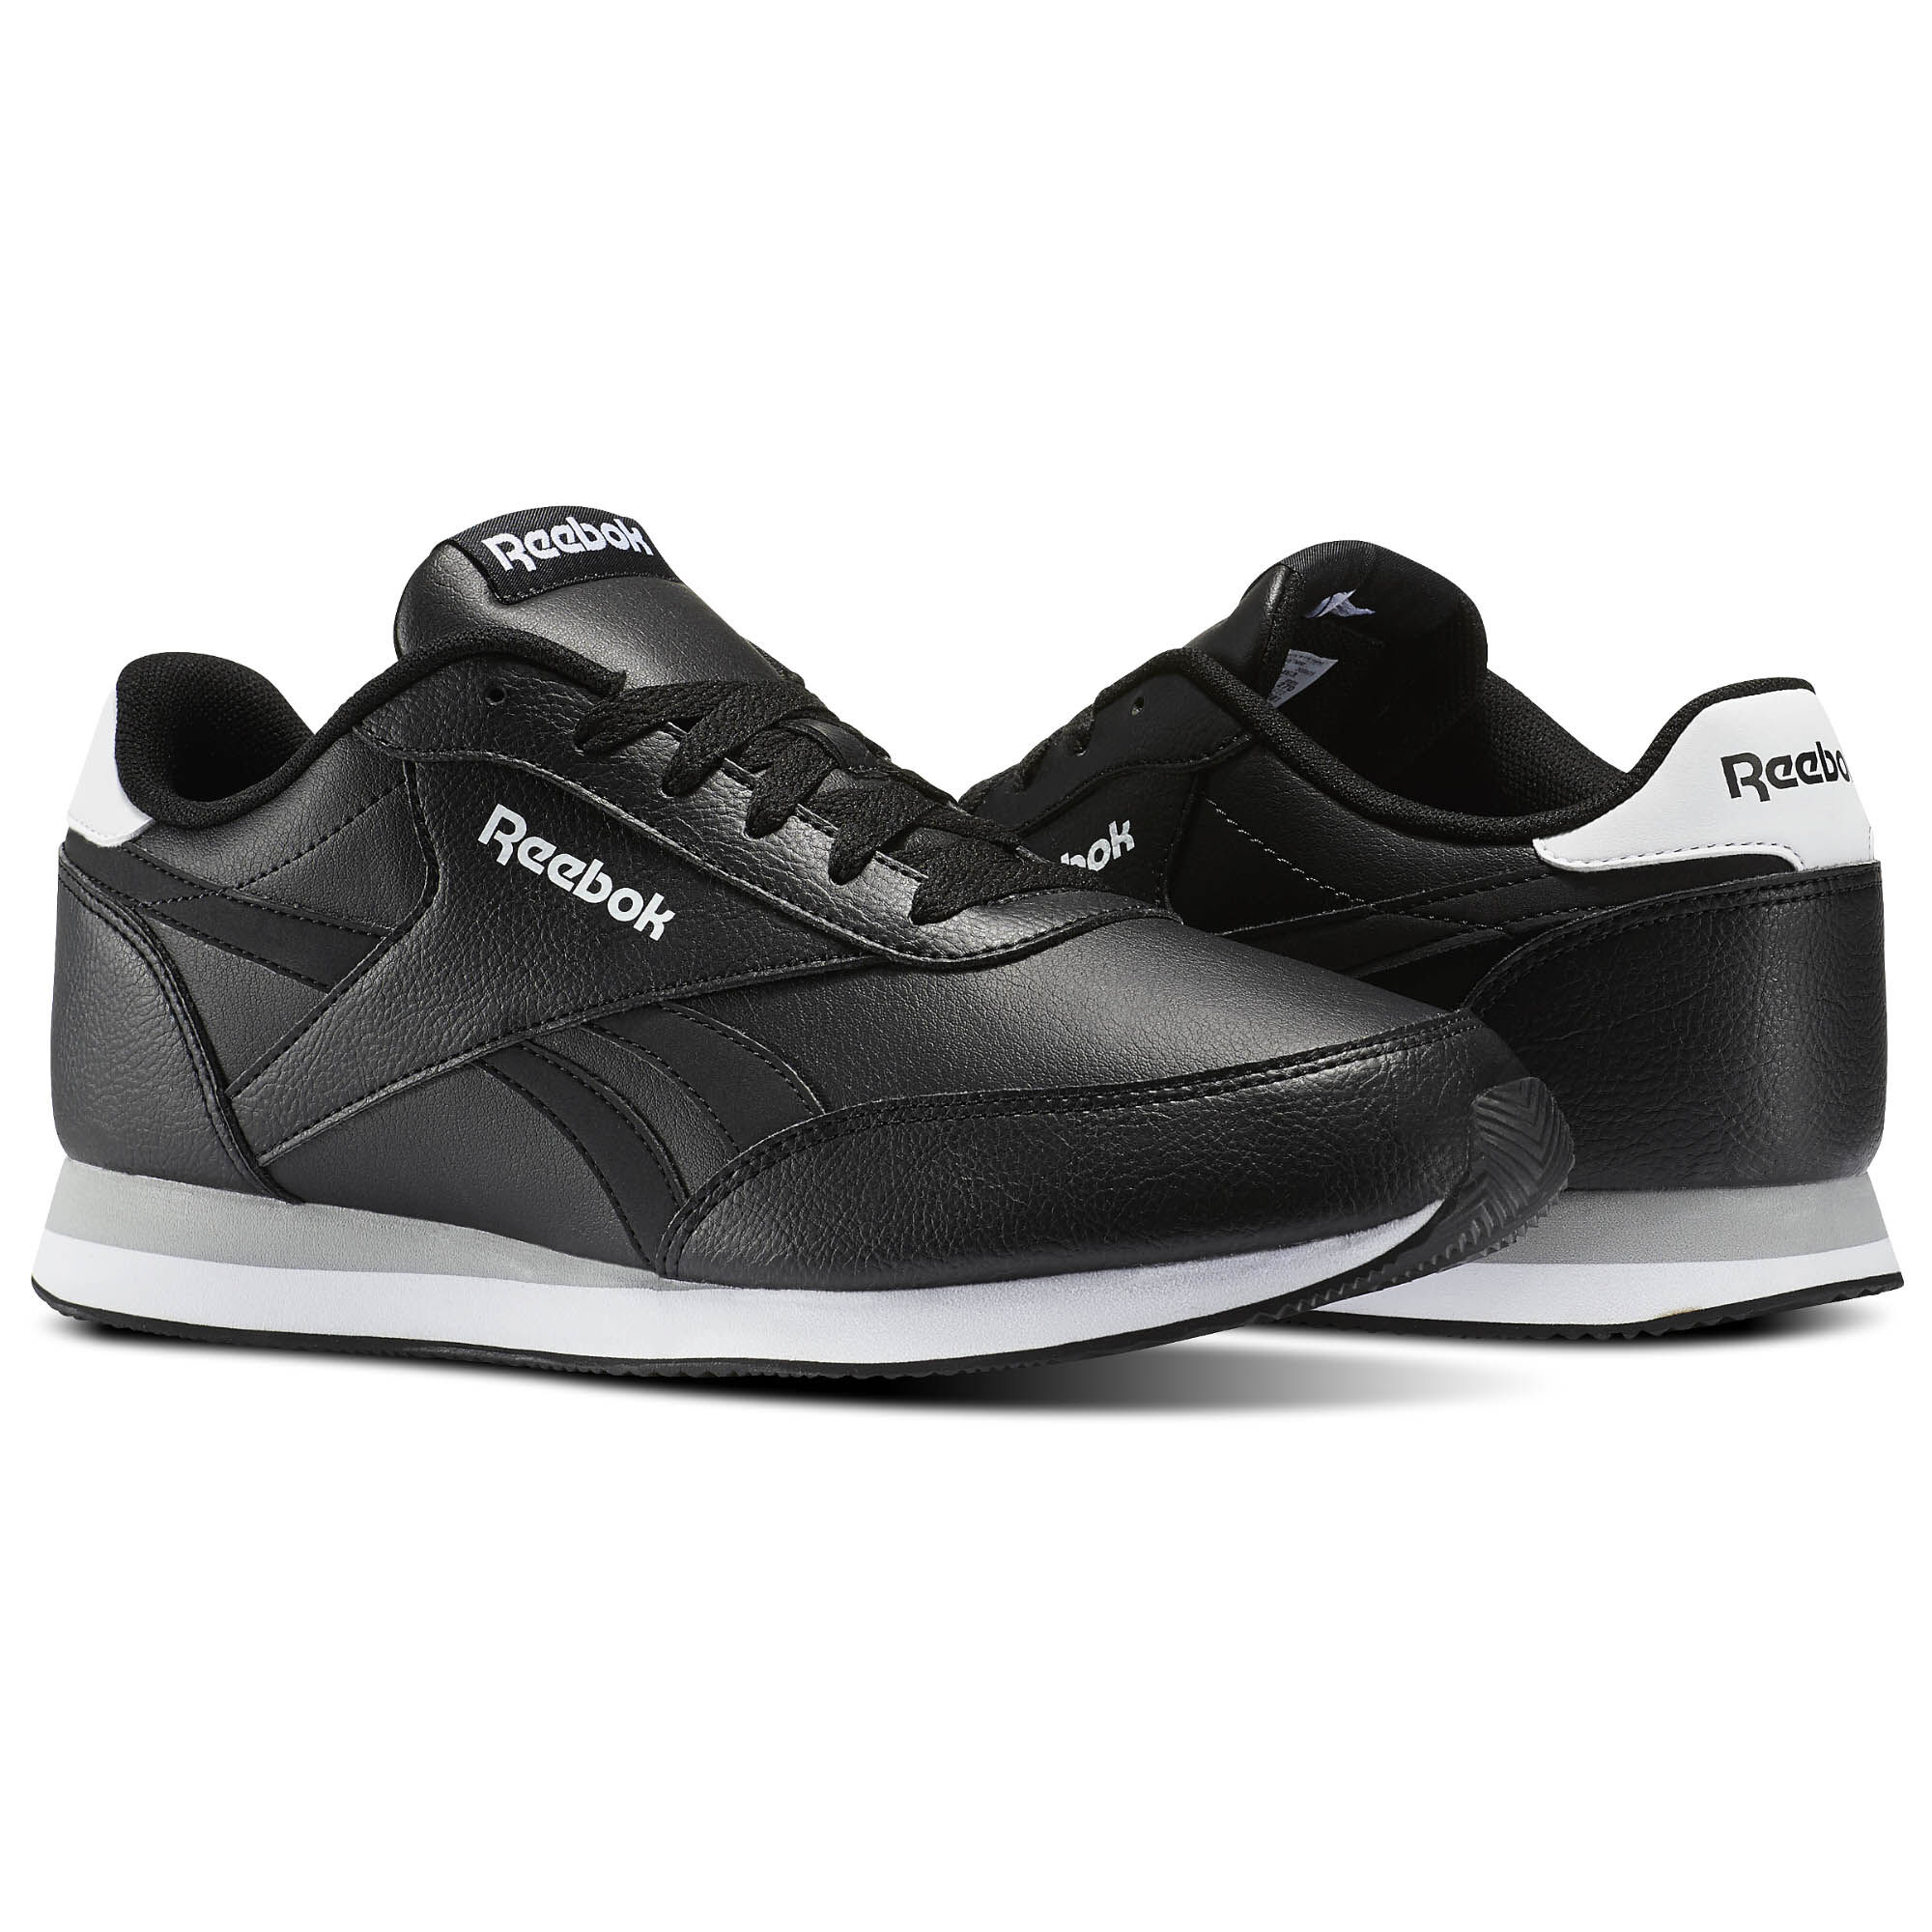 Reebok - Reebok Royal Classic Jogger 2L Black/White/Flat Grey V70722